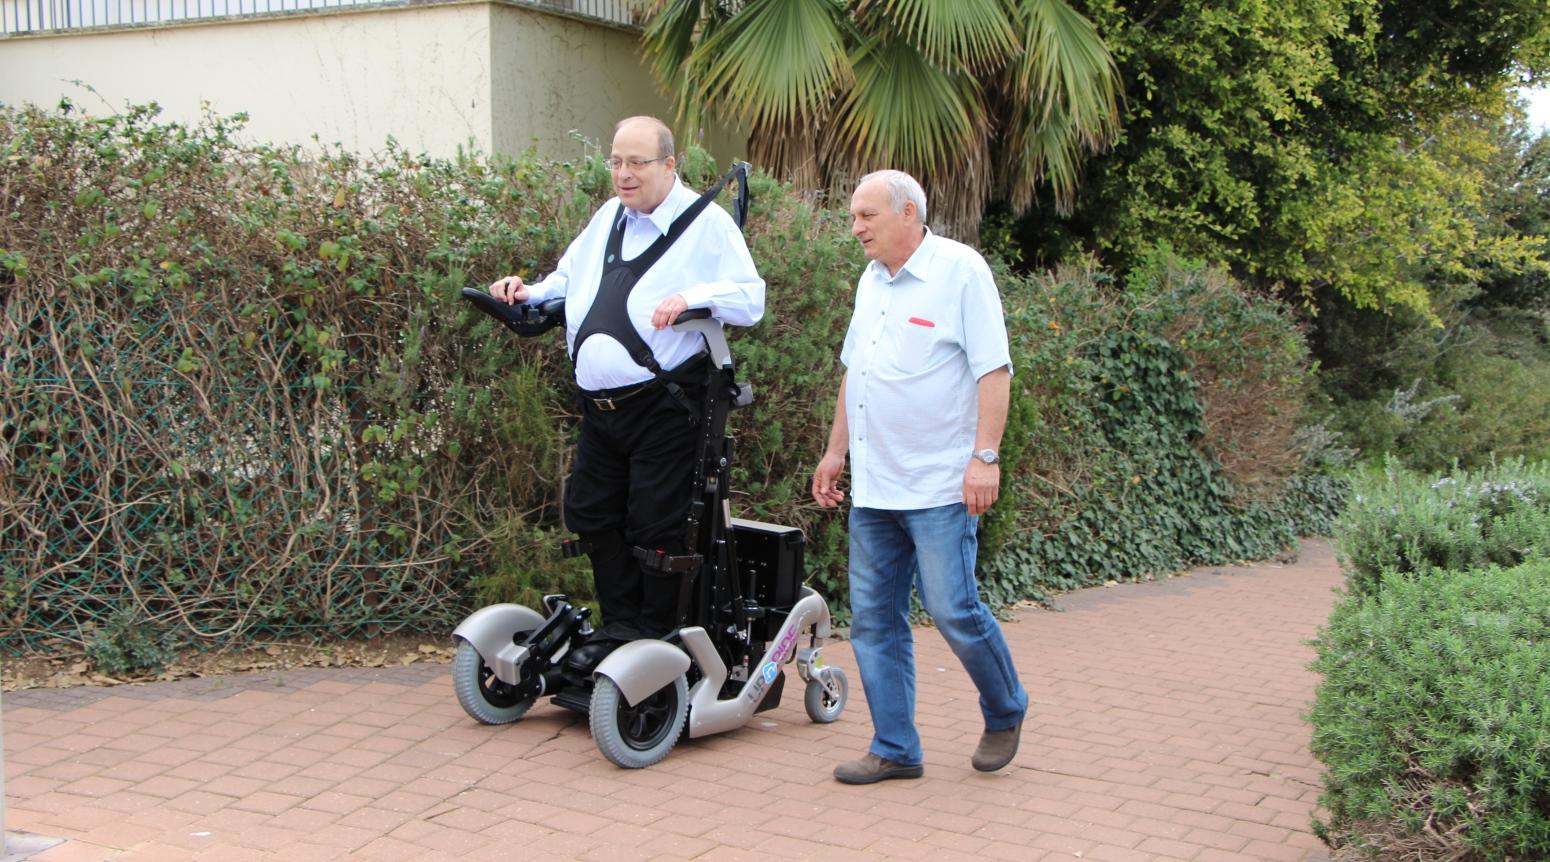 Rewalk Inventor Rolls Out Revolutionary Standing